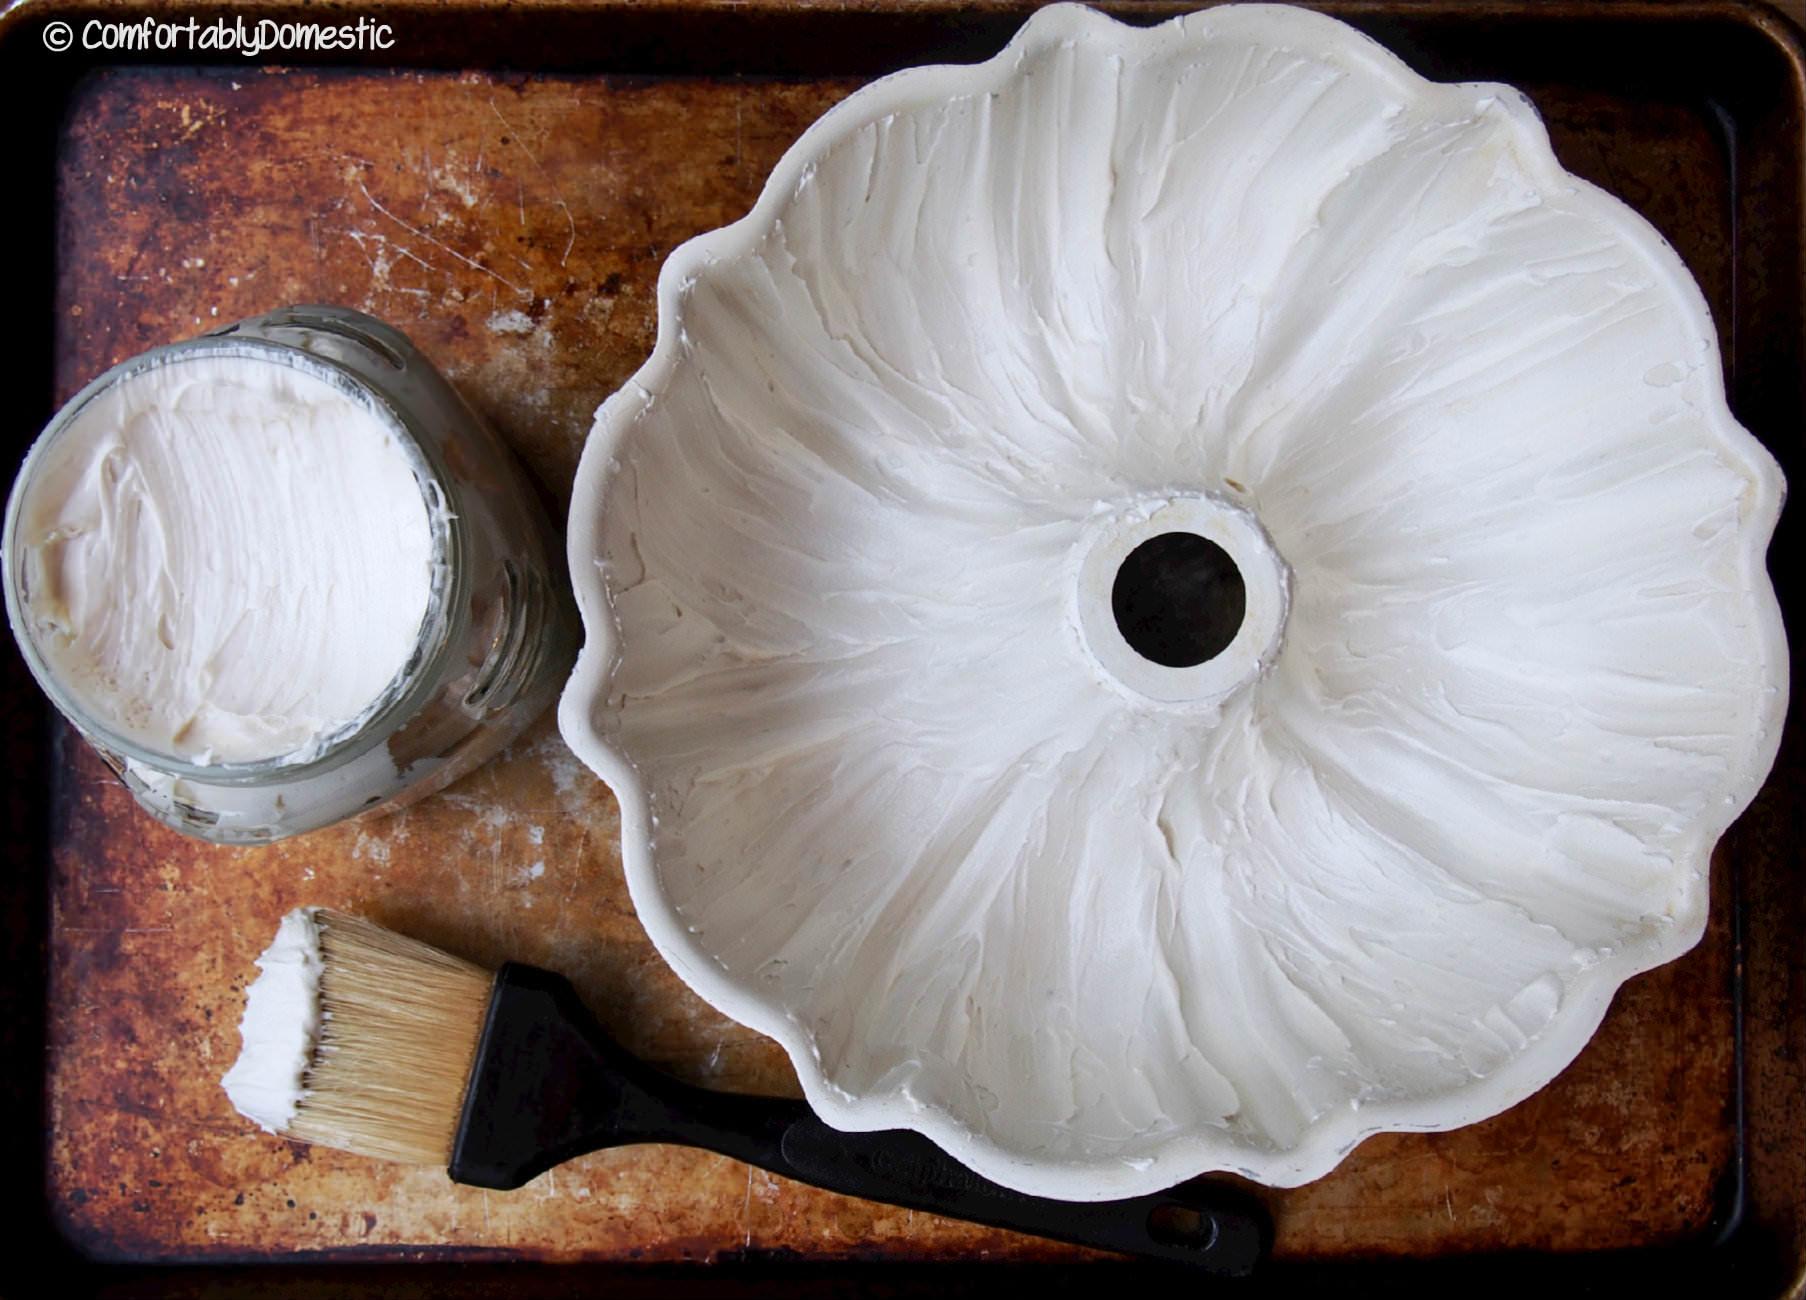 Baking Lube Pan Release via ComfortablyDomestic.com